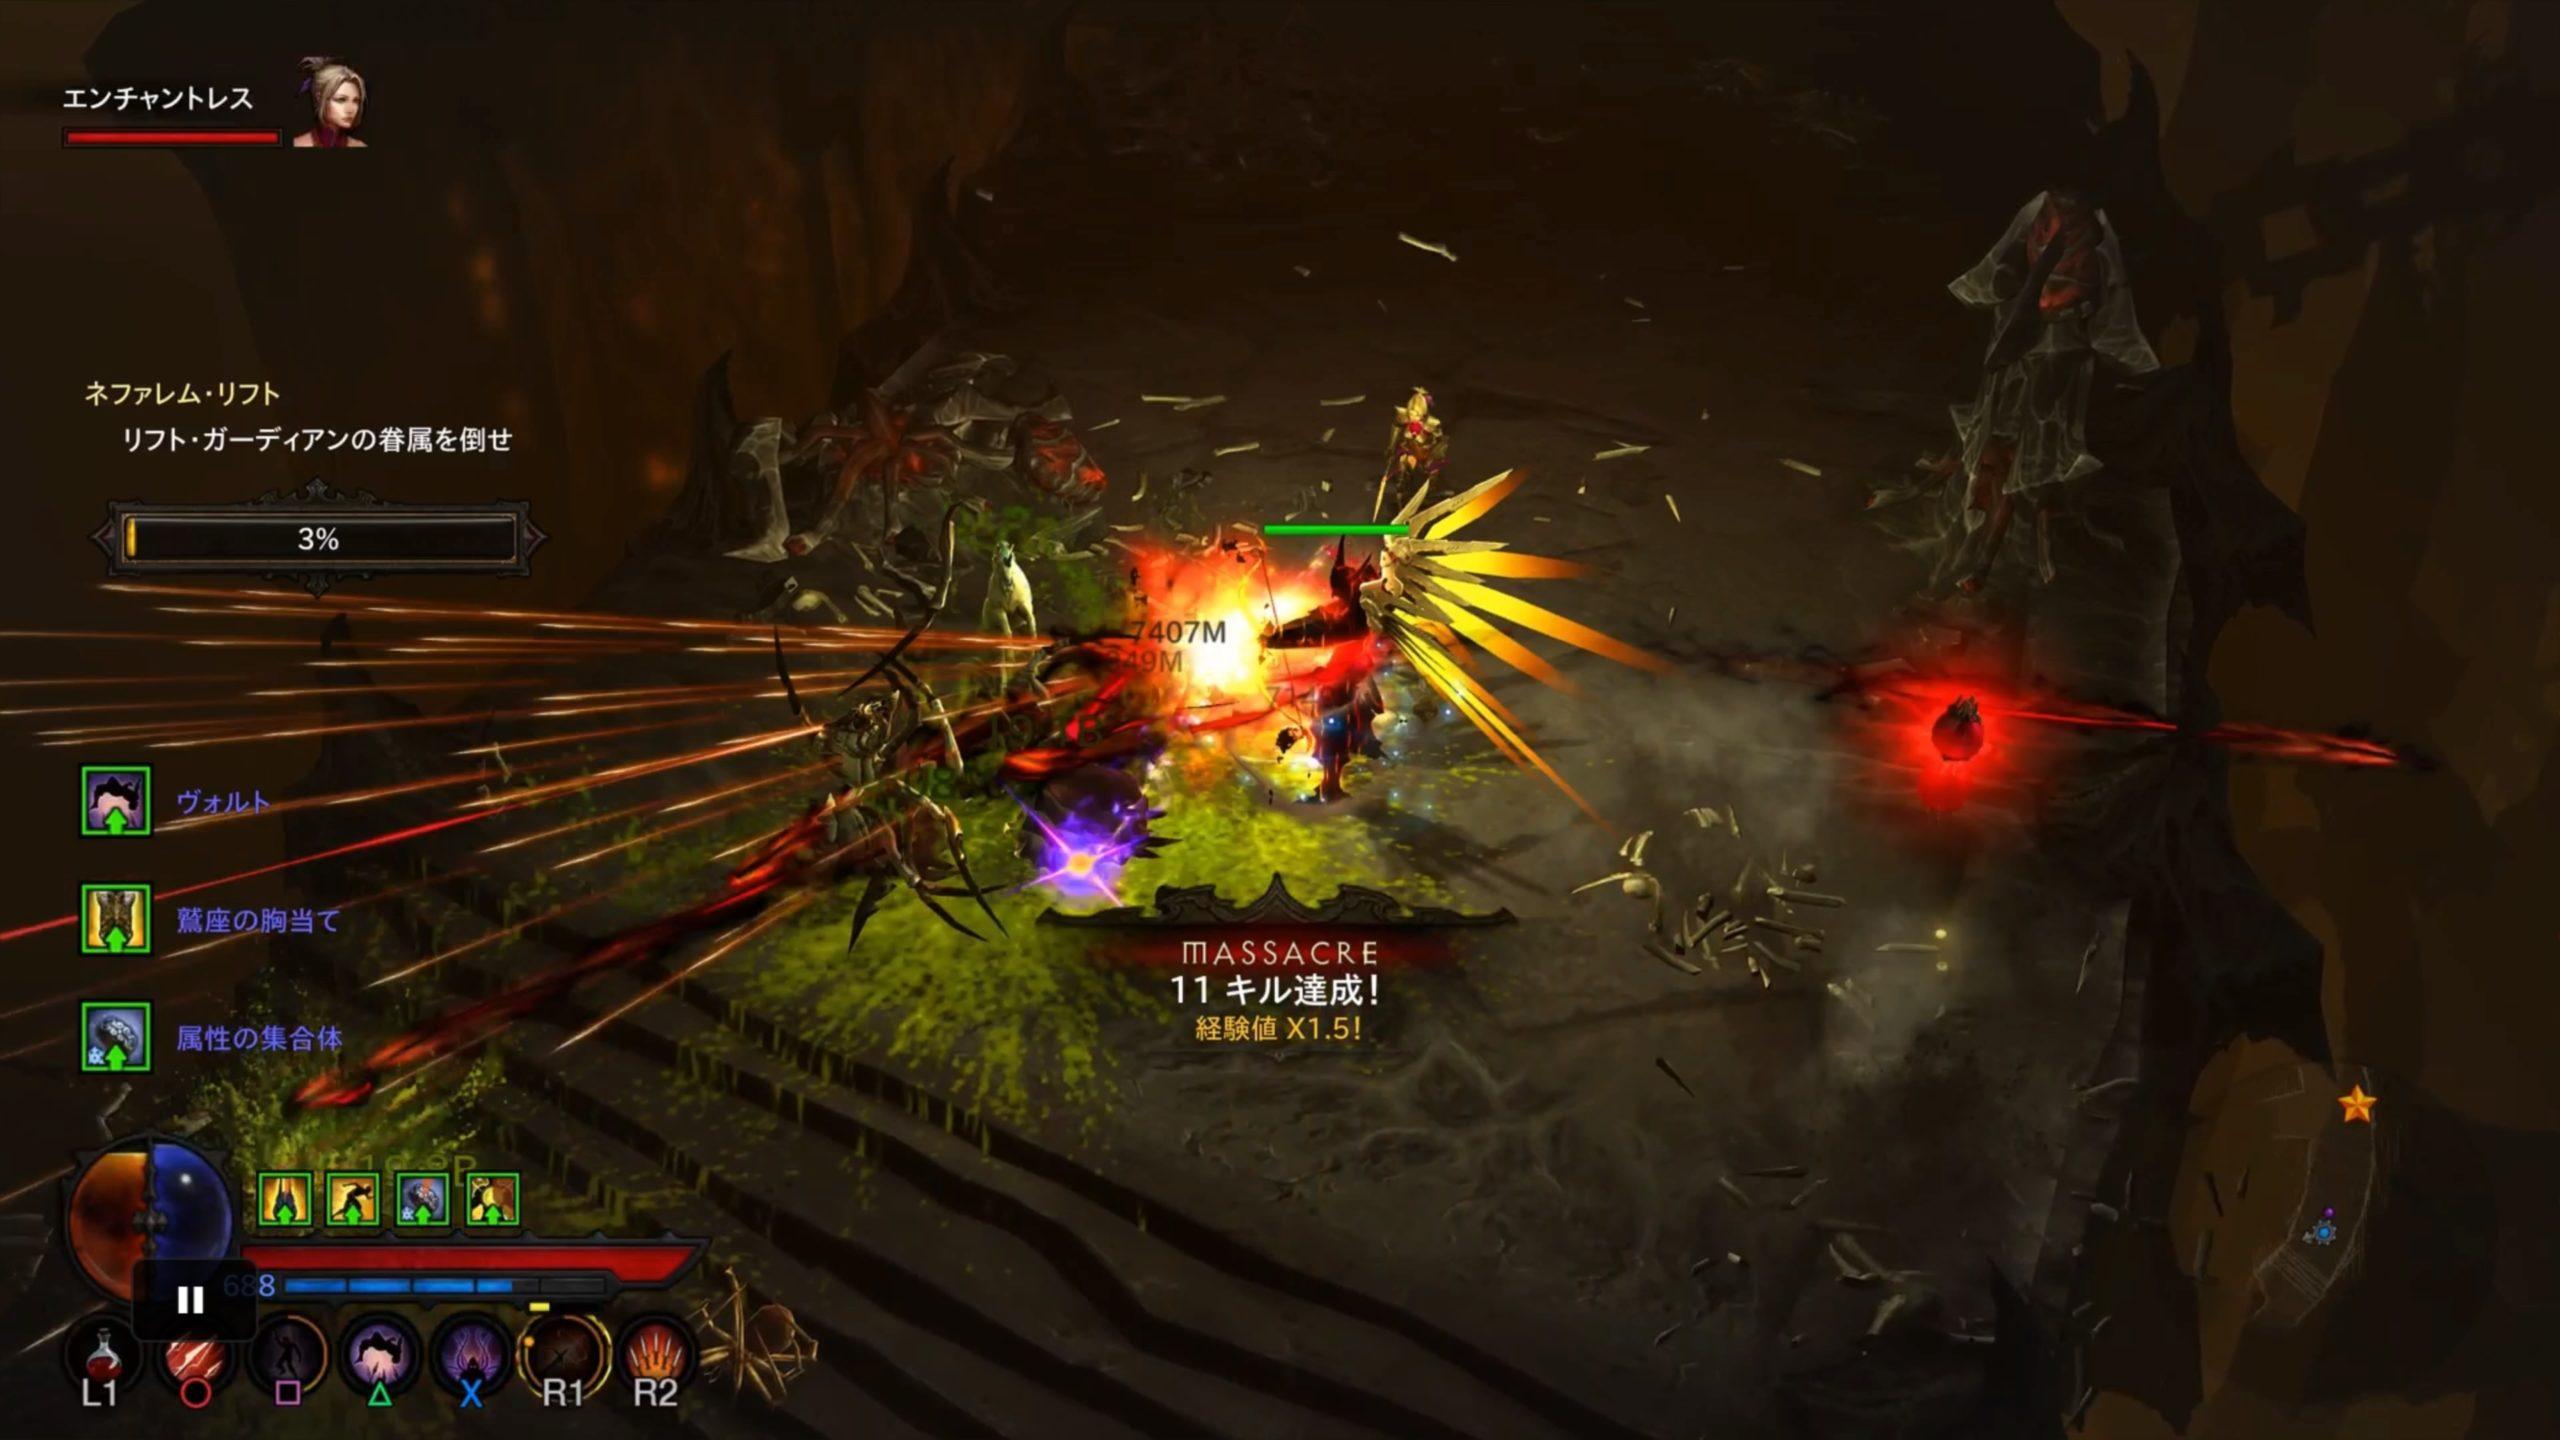 【Diablo III】ハクスラの最高峰【RPG】【レビュー】